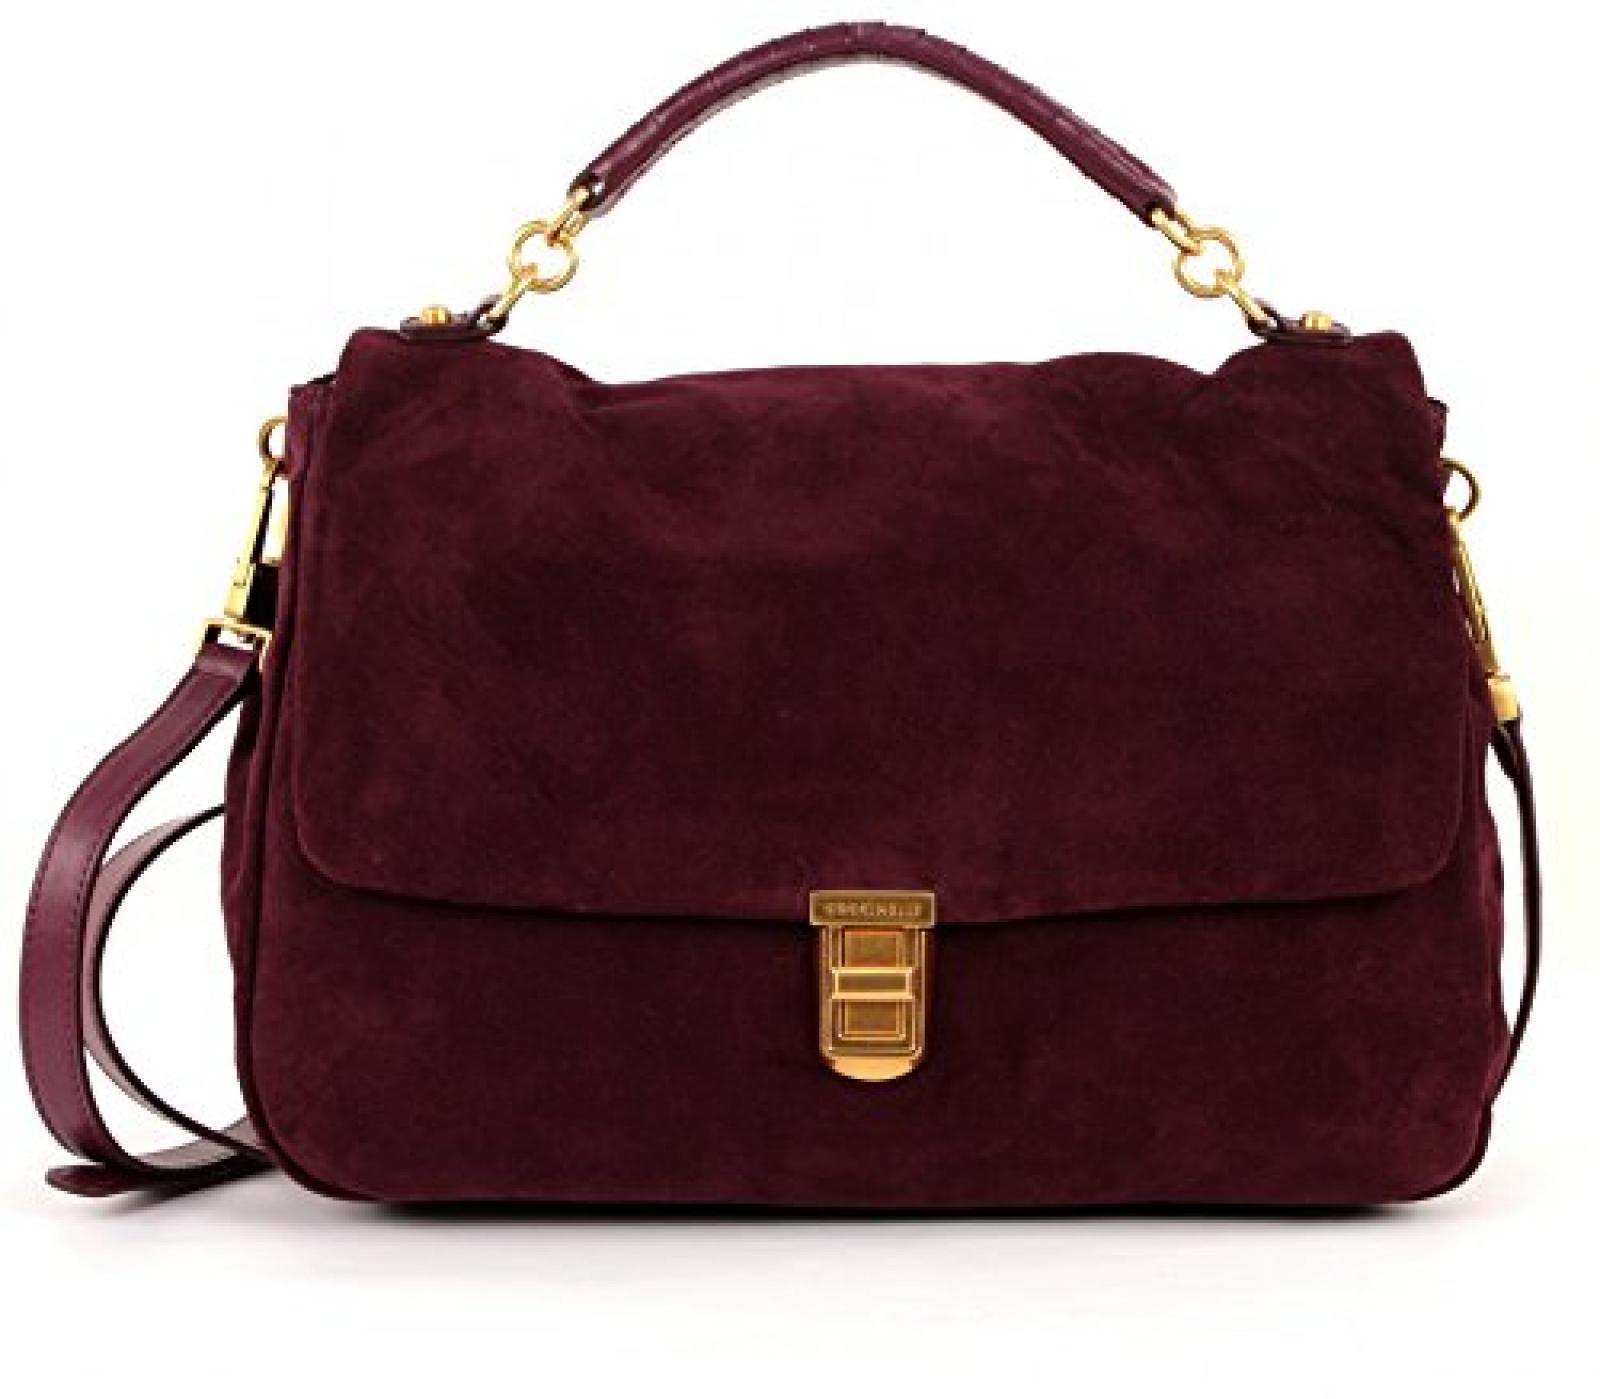 ORIGINAL COCCINELLE Tasche Oscar Suede Damen Bordeaux - c1ti0180101286